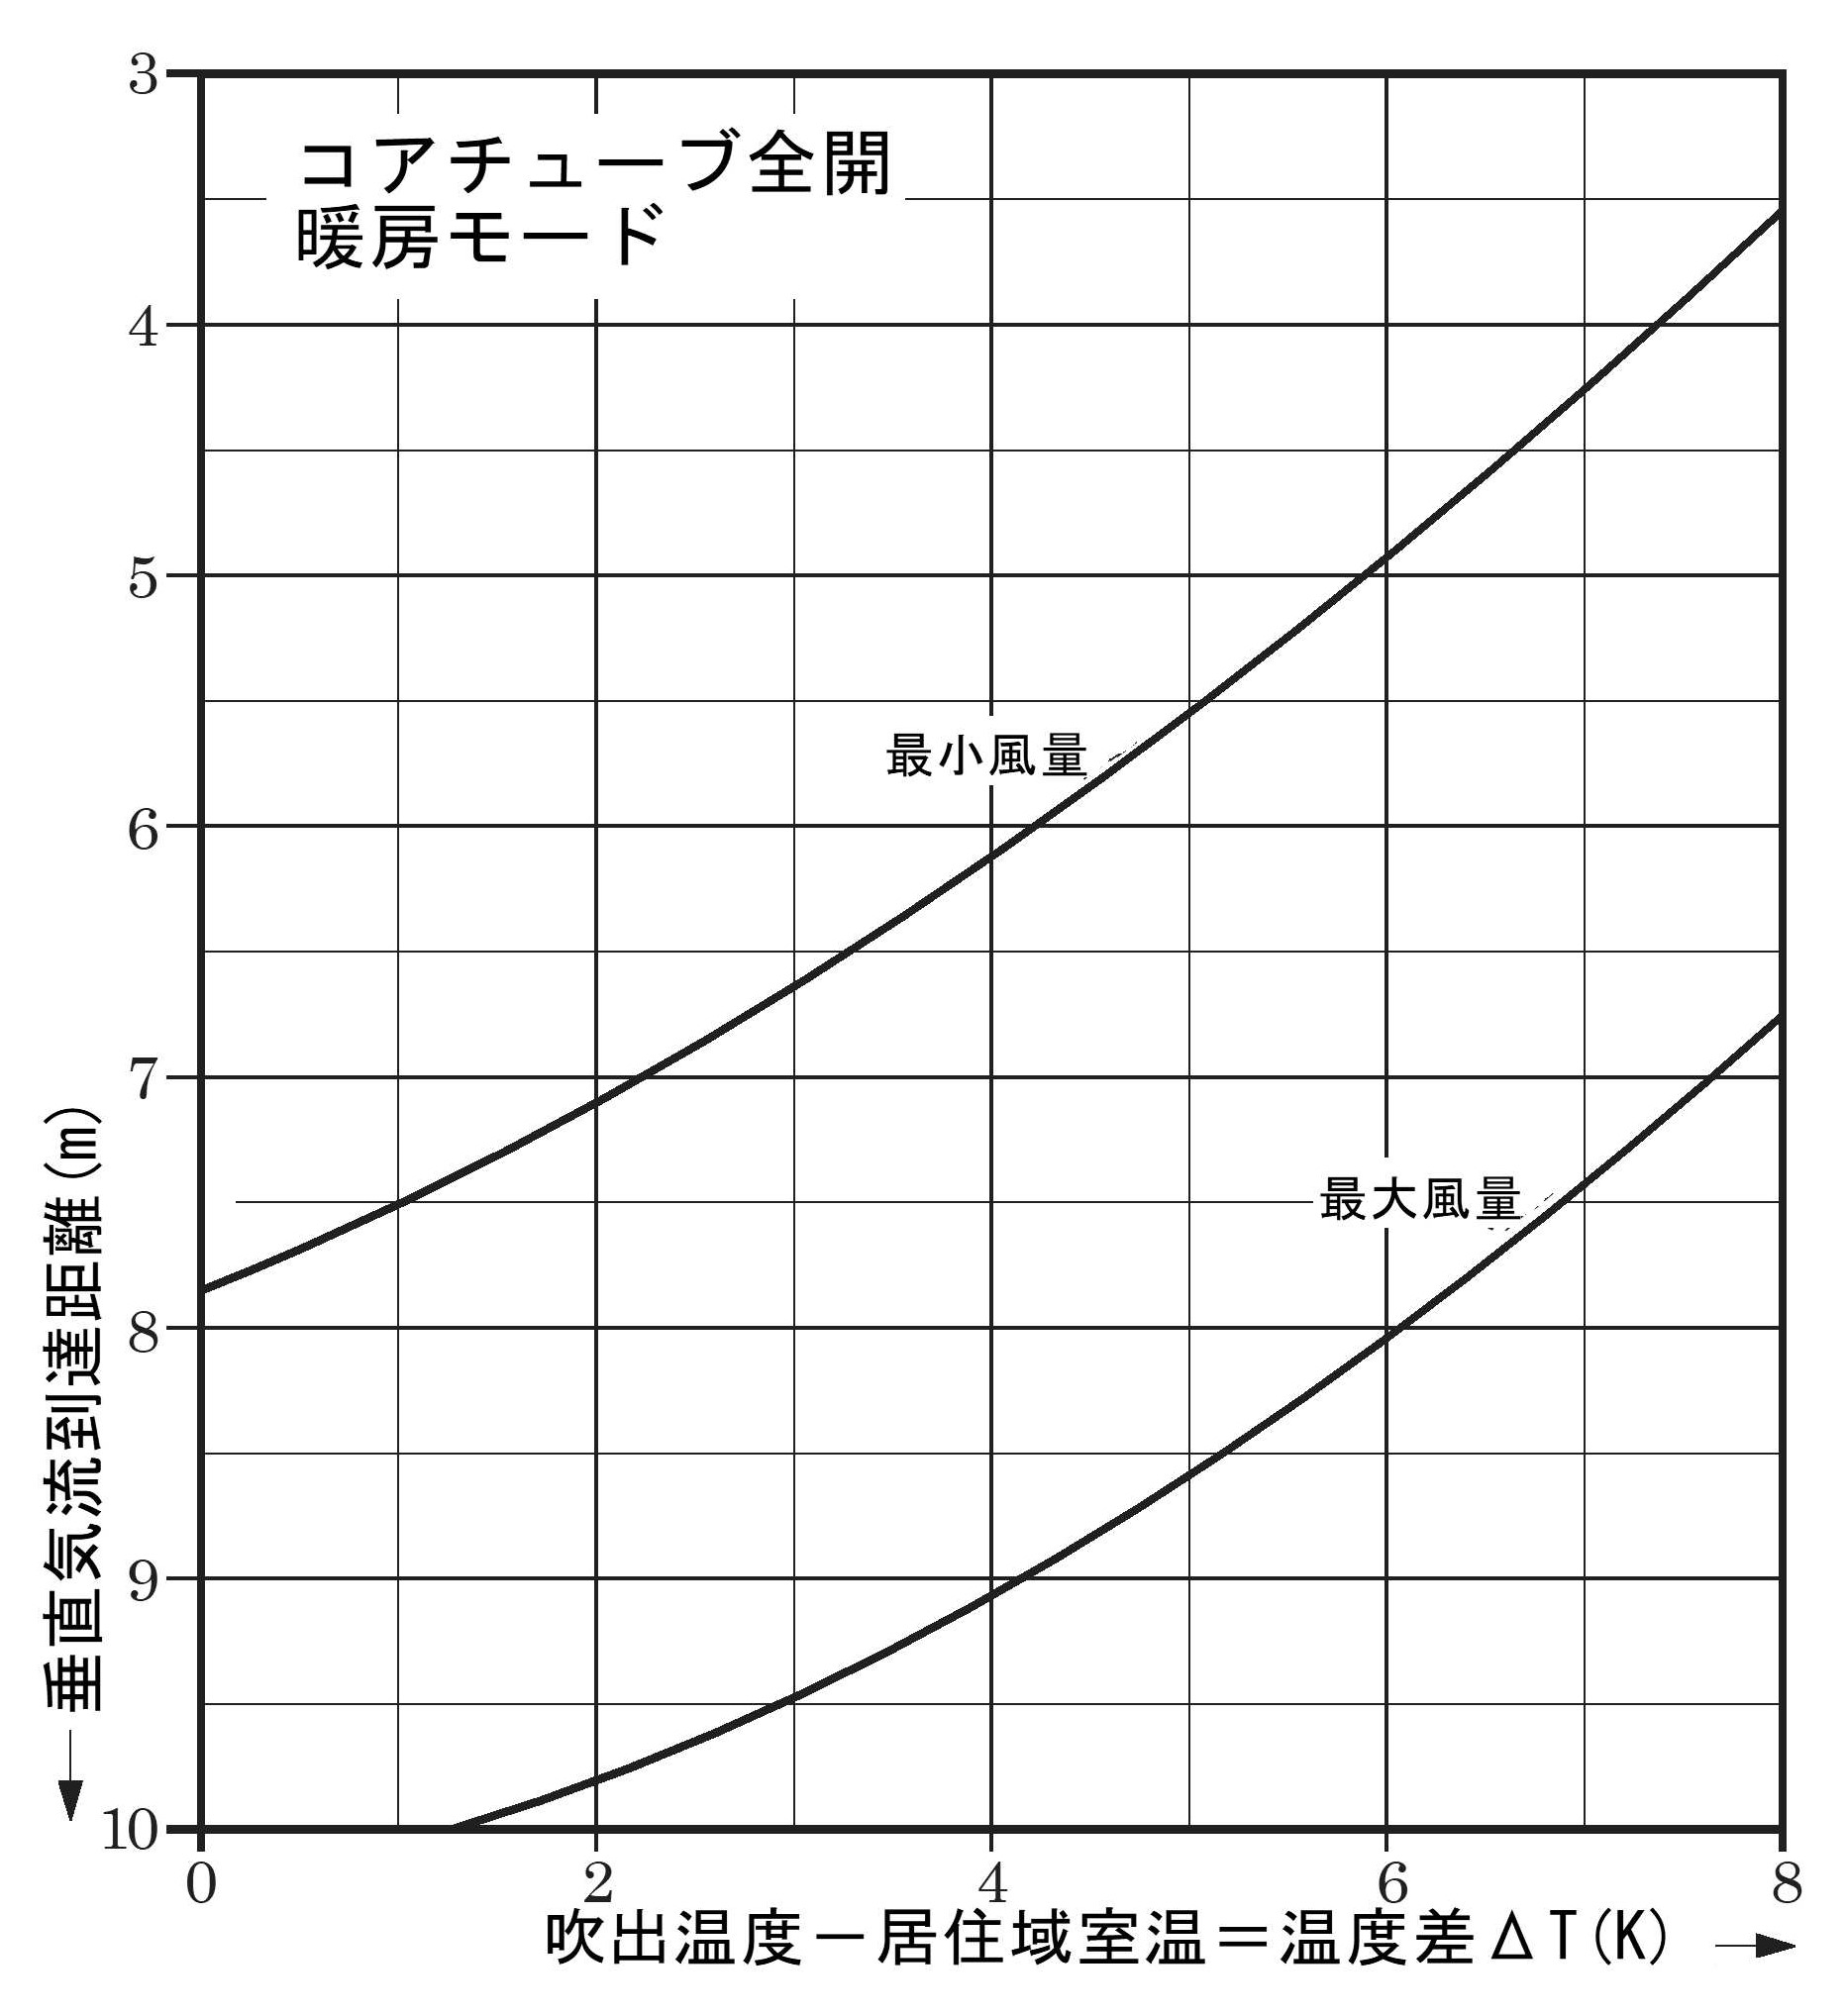 垂直方向の風速(冷房時)と気流到達距離(暖房時)